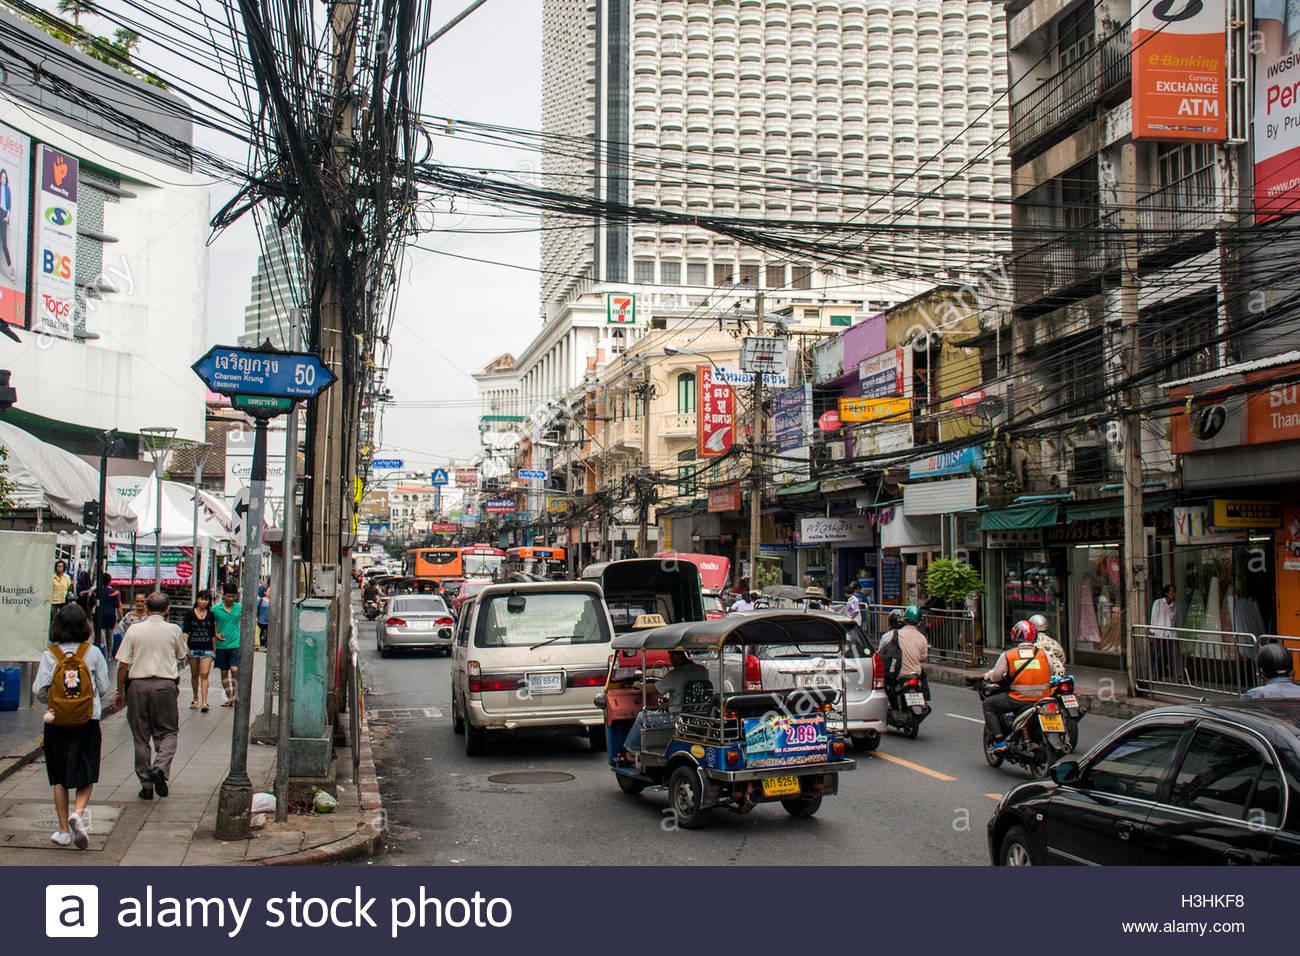 streets-of-bangkok-thailand-rush-hour-daily-business-H3HKF8